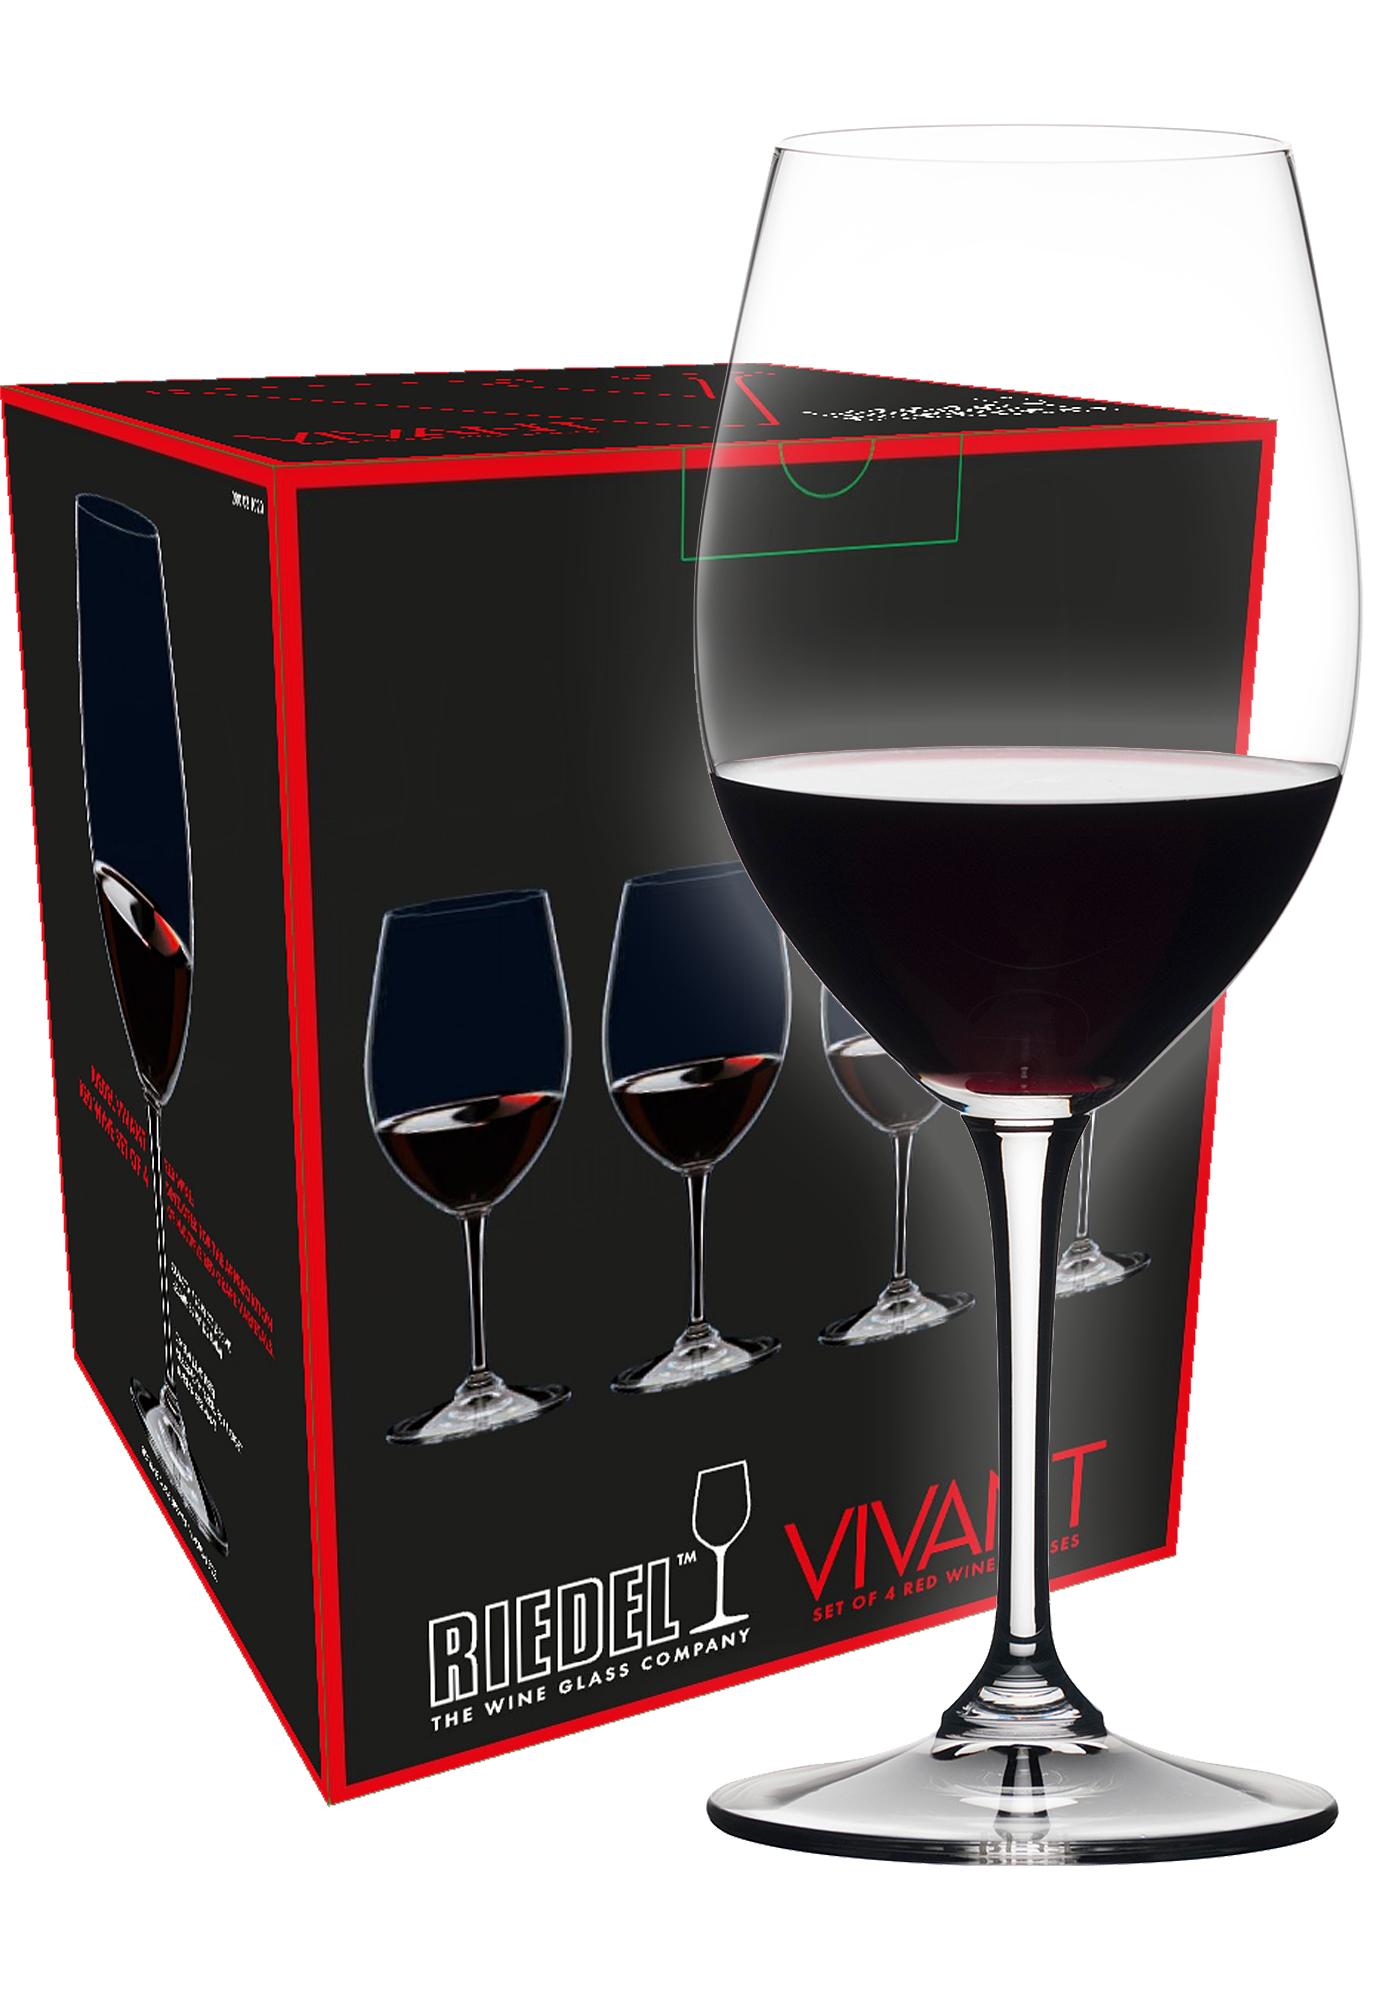 Riedel Vivant Tasting Red wijnglas (set van 4 voor € 34,80)